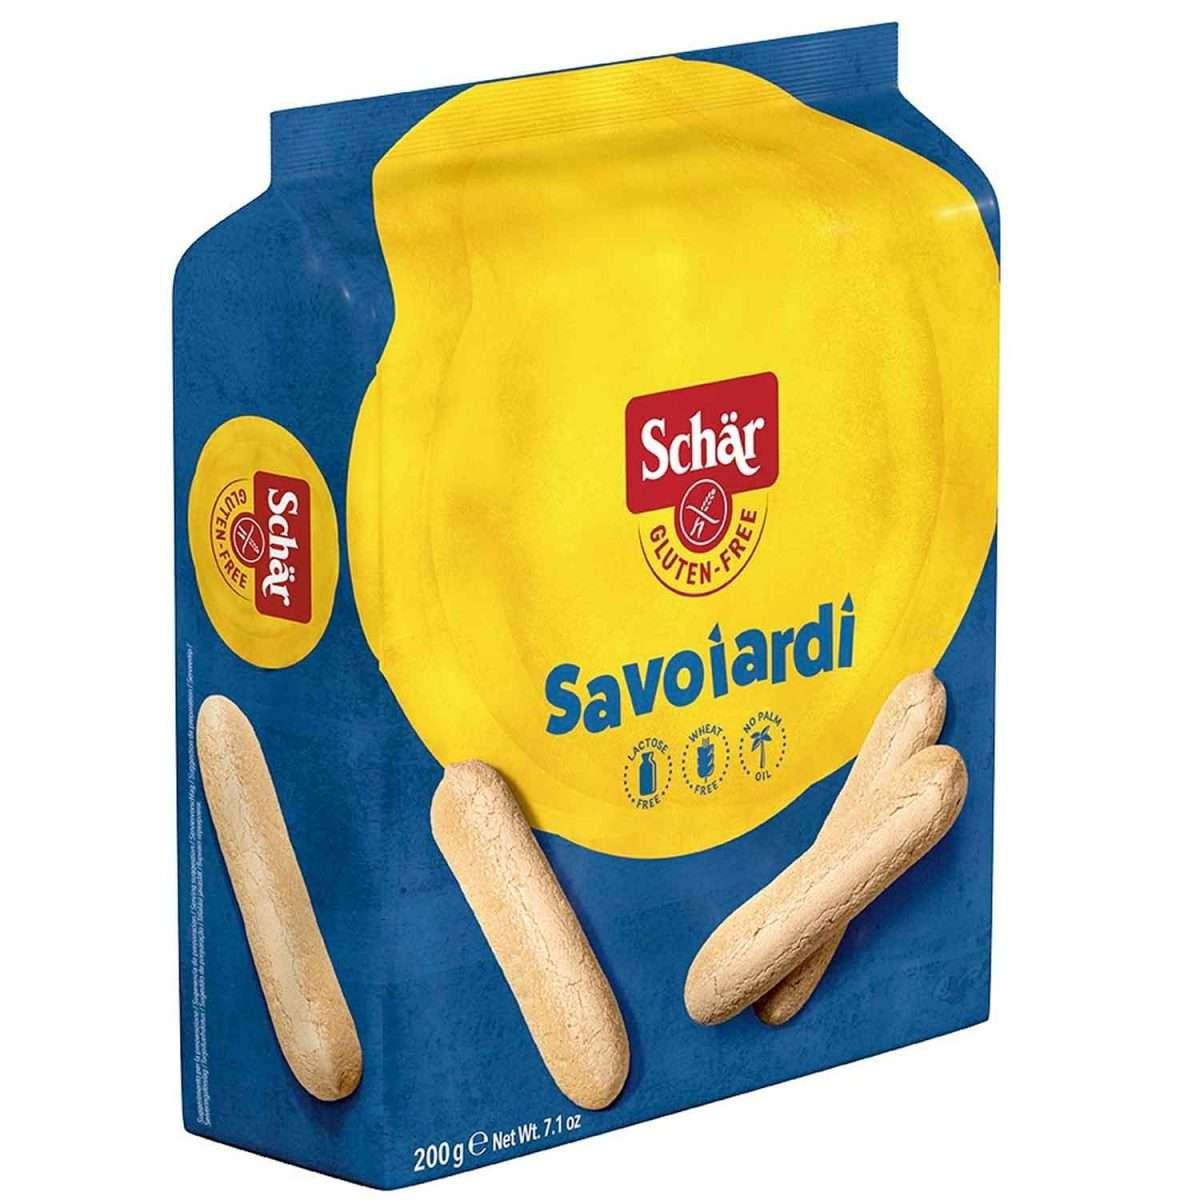 Bizcochos Soletilla Savoiardi Schär 200g